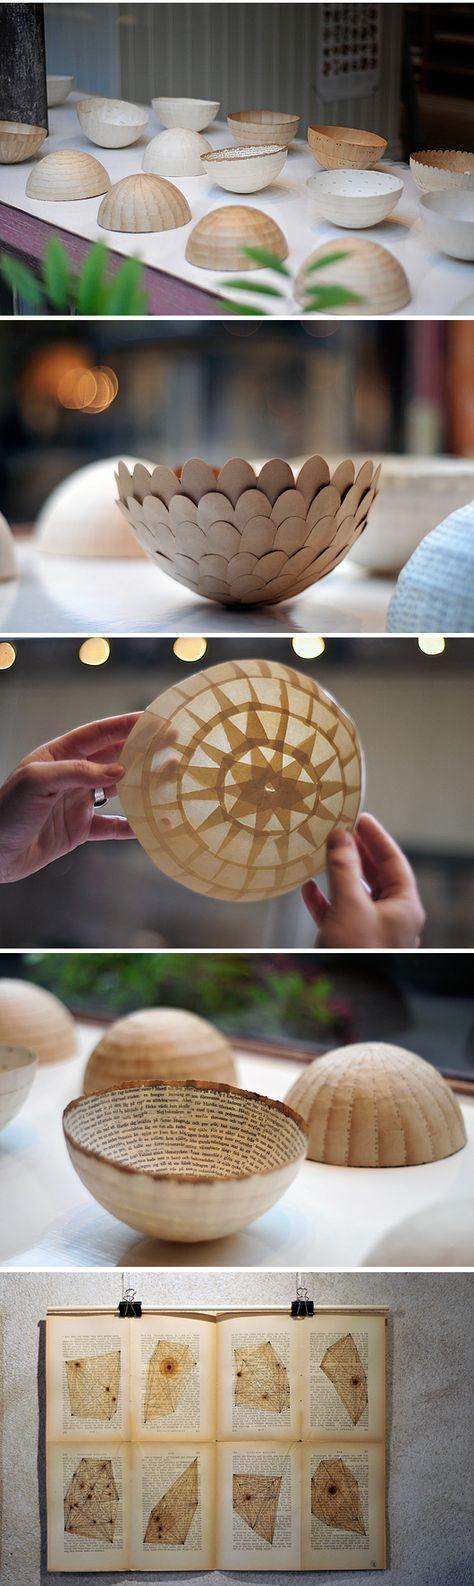 paper bowls scandinavian interior trend